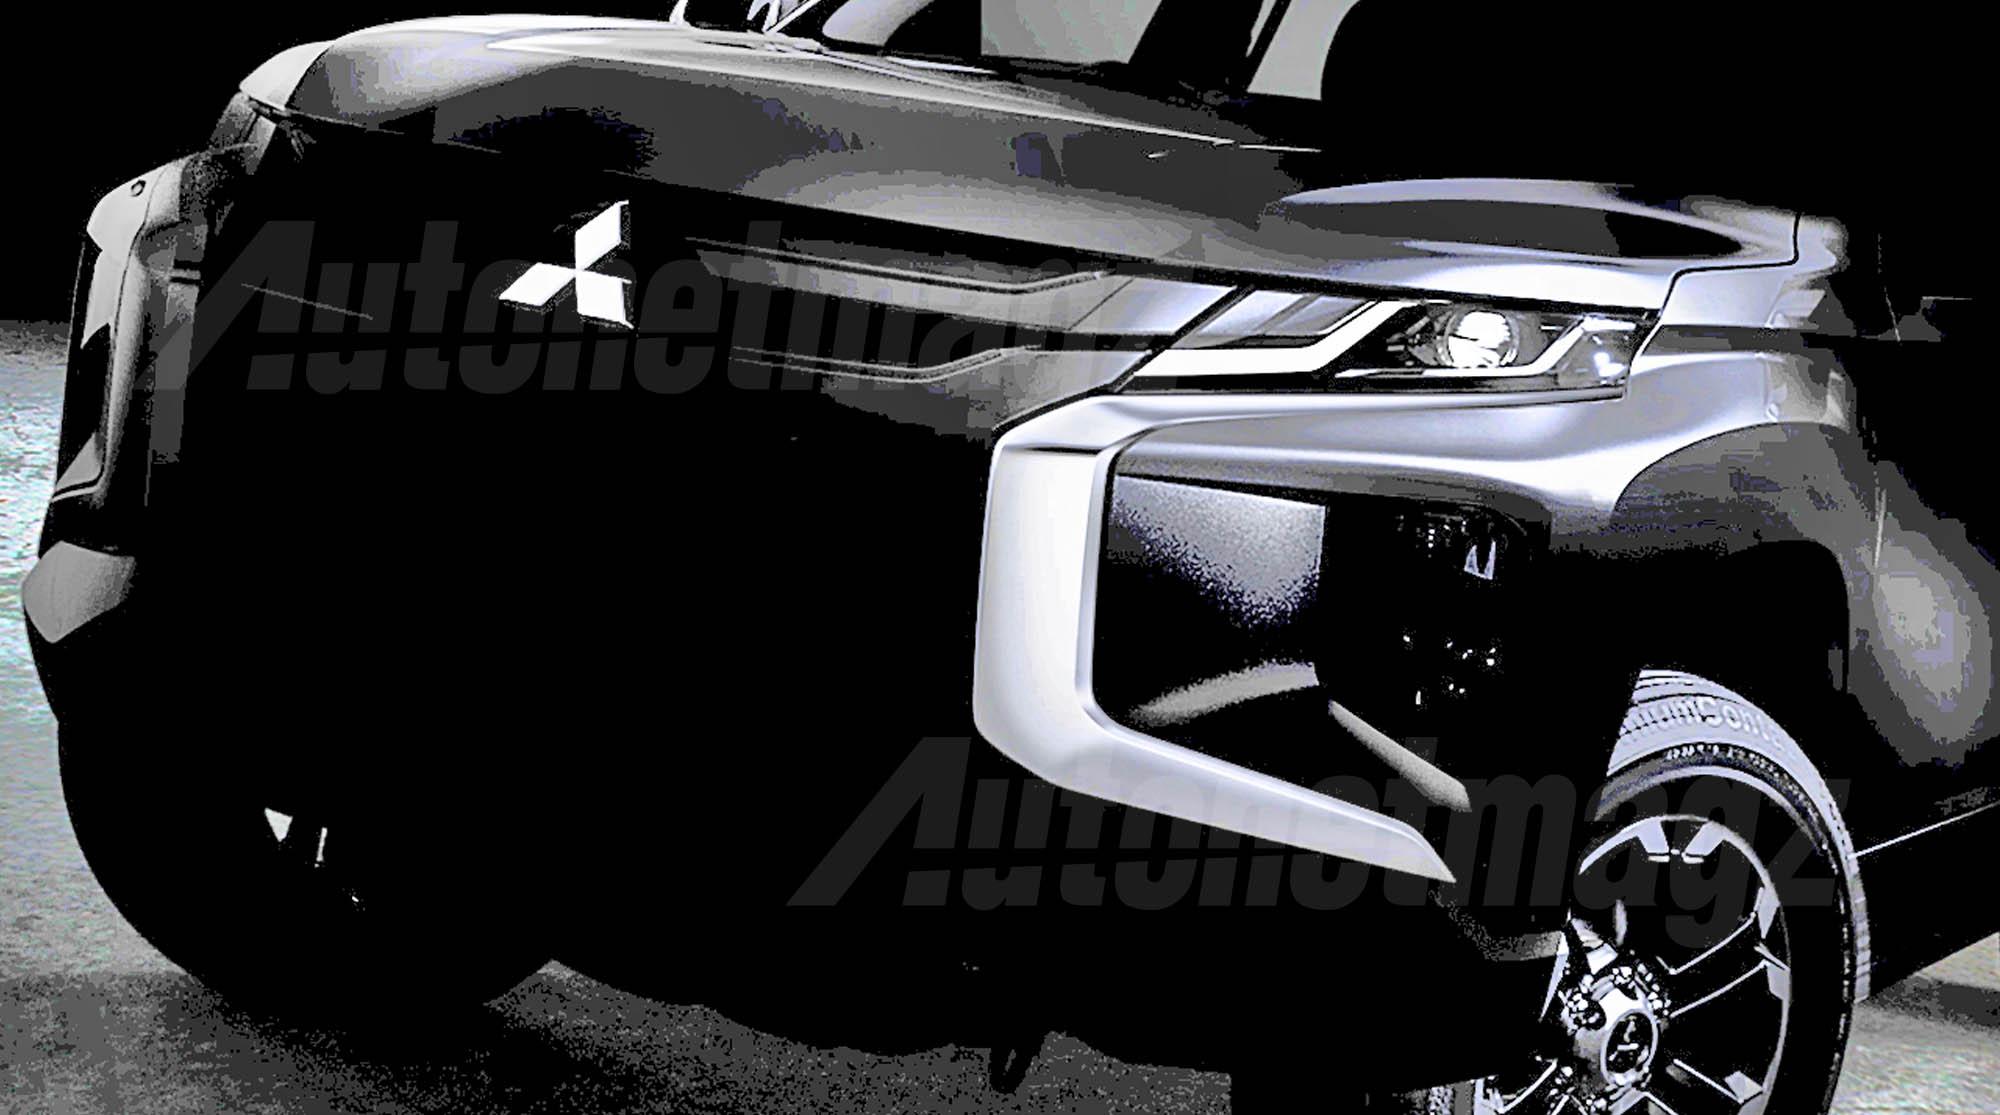 Berita, Teaser Mitsubishi L200 Strada Triton Wajah: Teaser Mitsubishi Triton Facelift Diumbar, Muka Ala Pajero Sport!